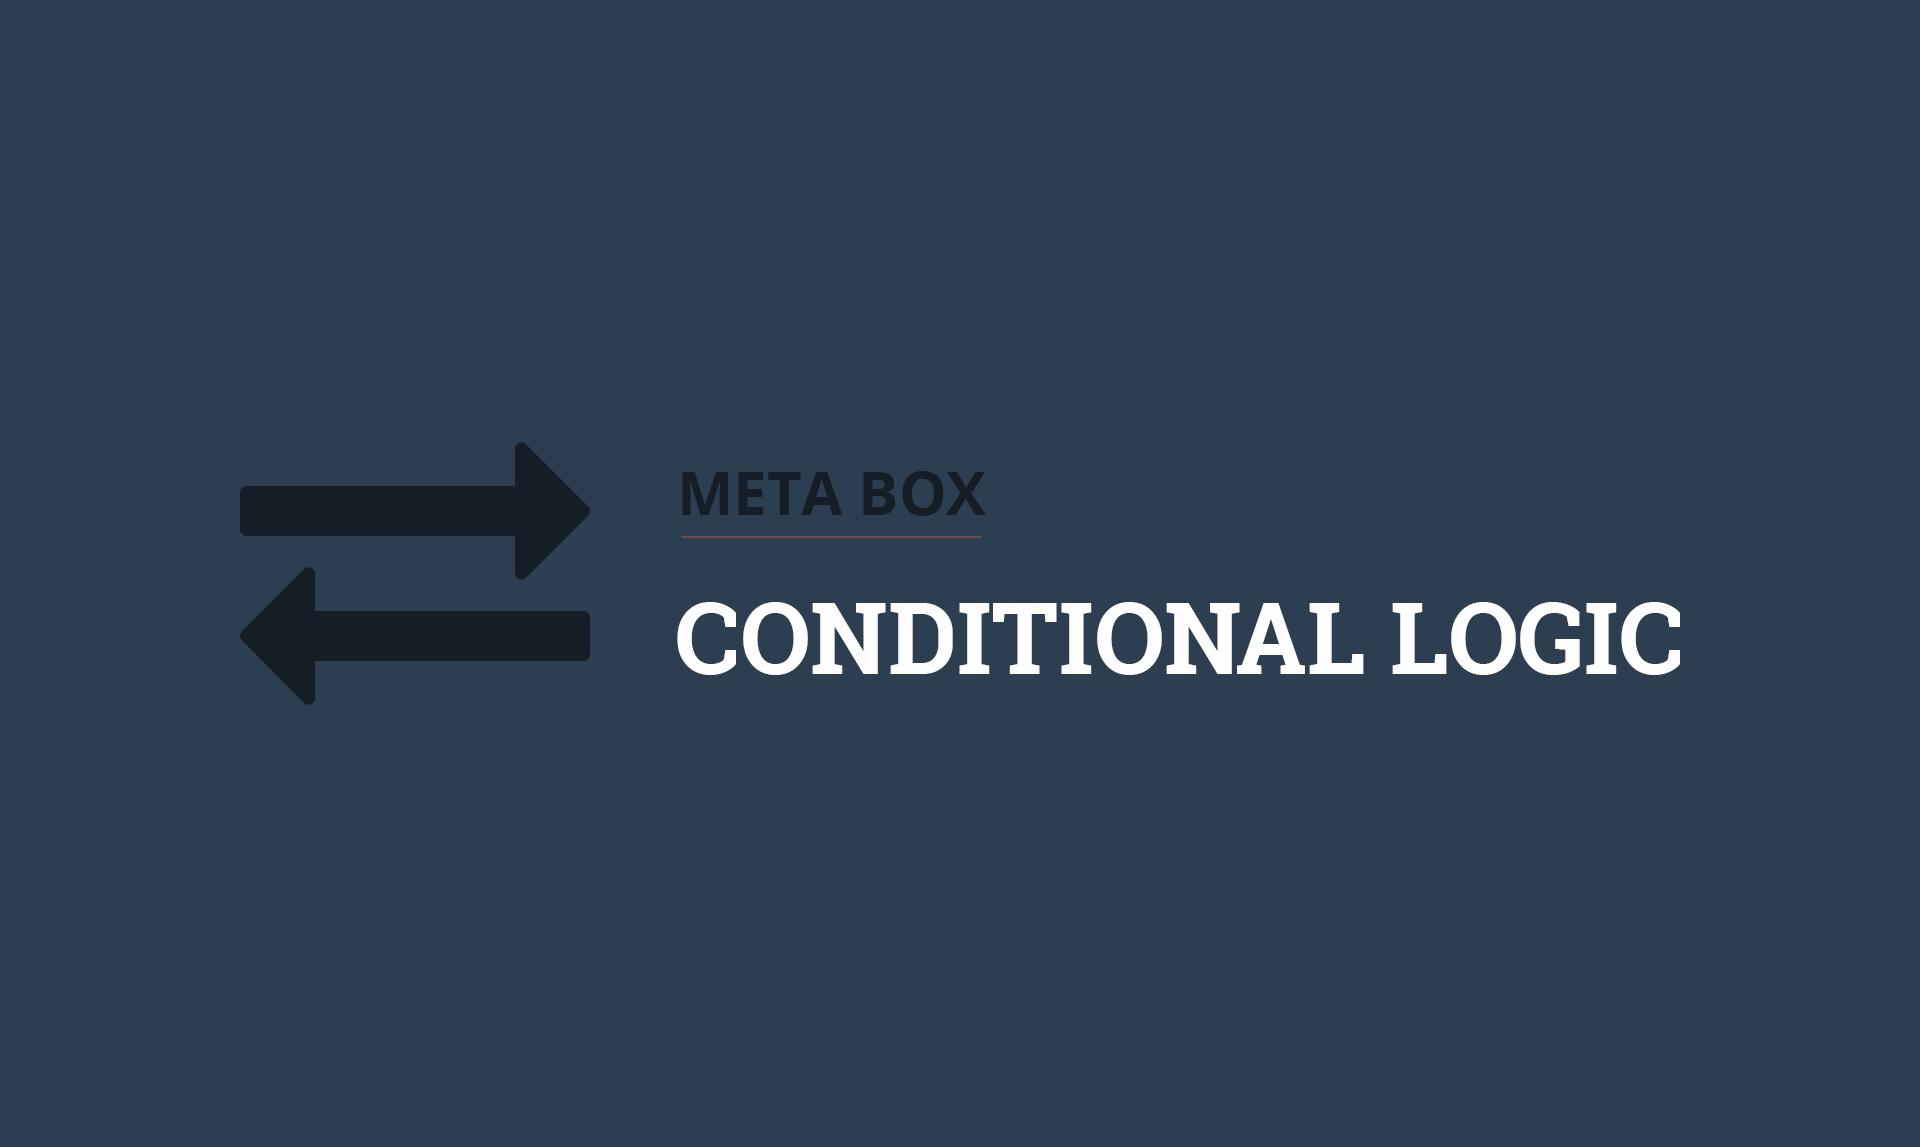 Meta Box Conditional Logic